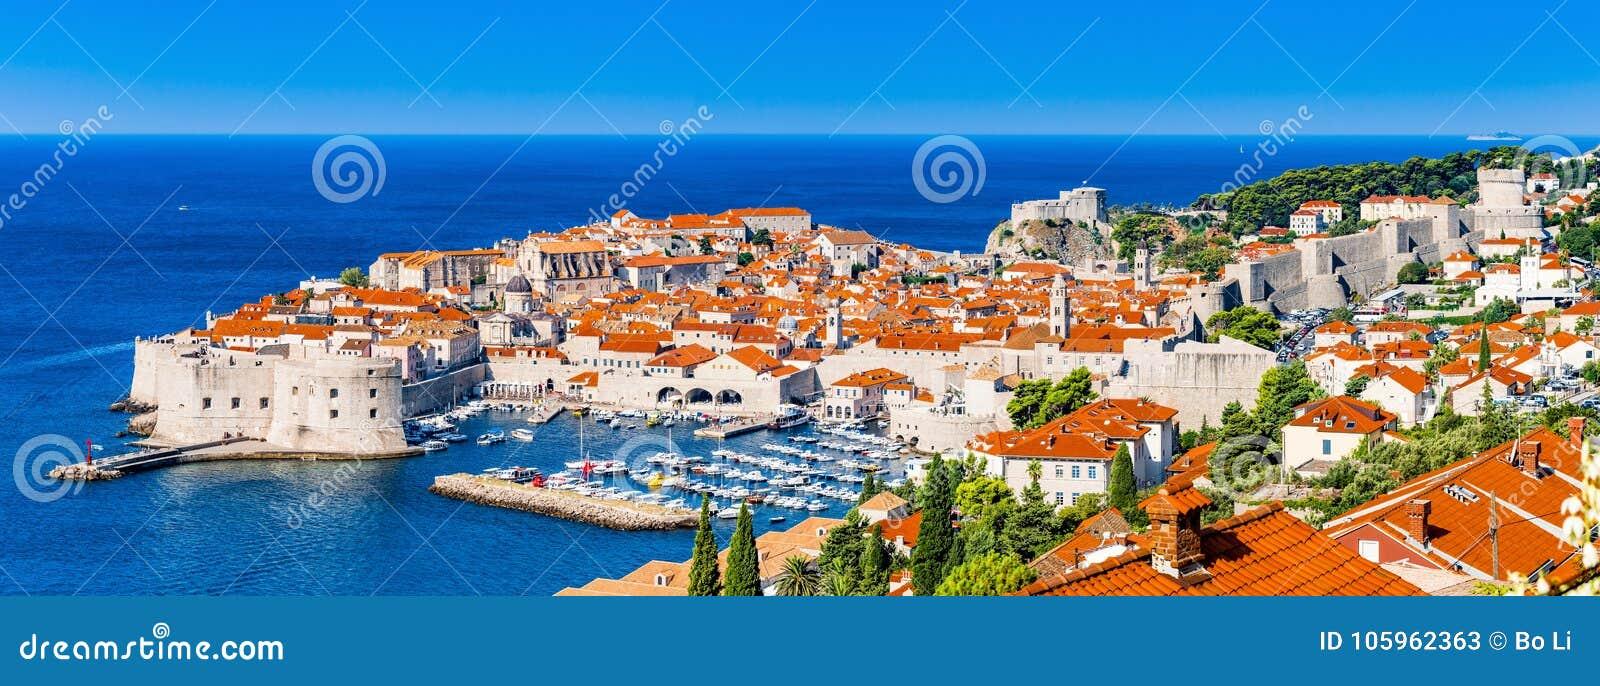 Panorama von Dubrovnik in Kroatien